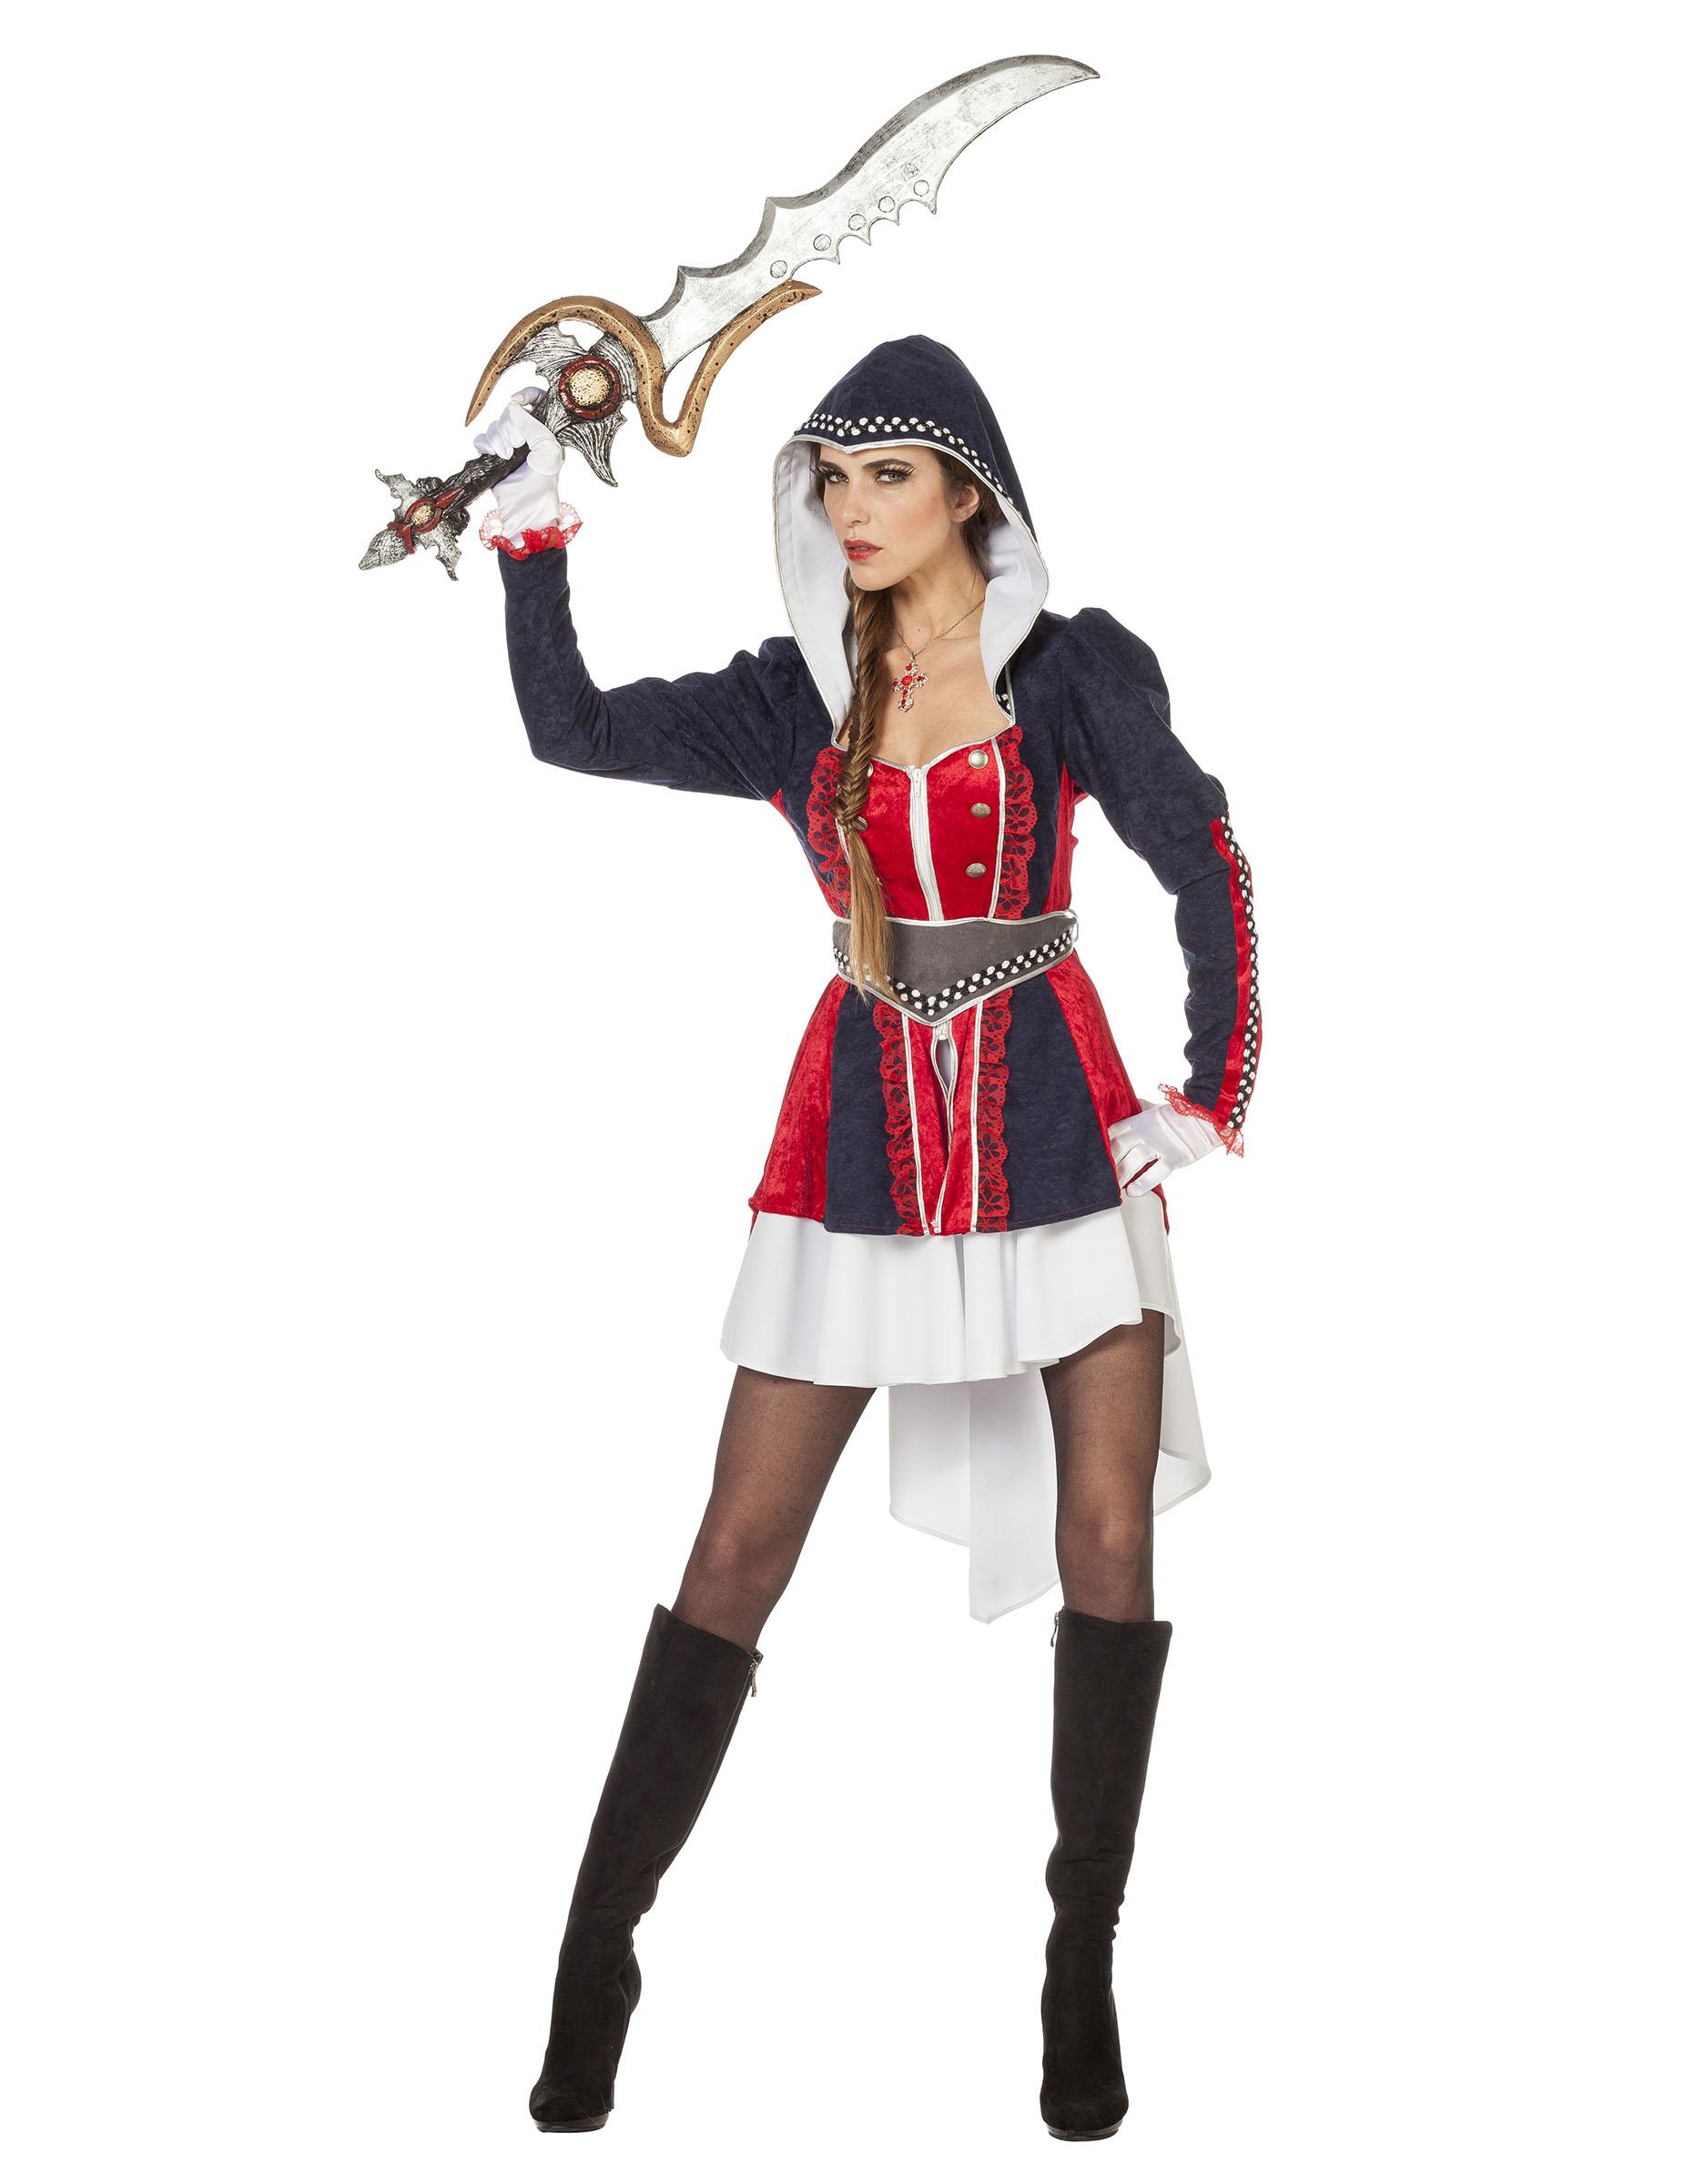 HARLEY Quinn Costume Calze Supereroe Donna Costume Costume Adulto Ac